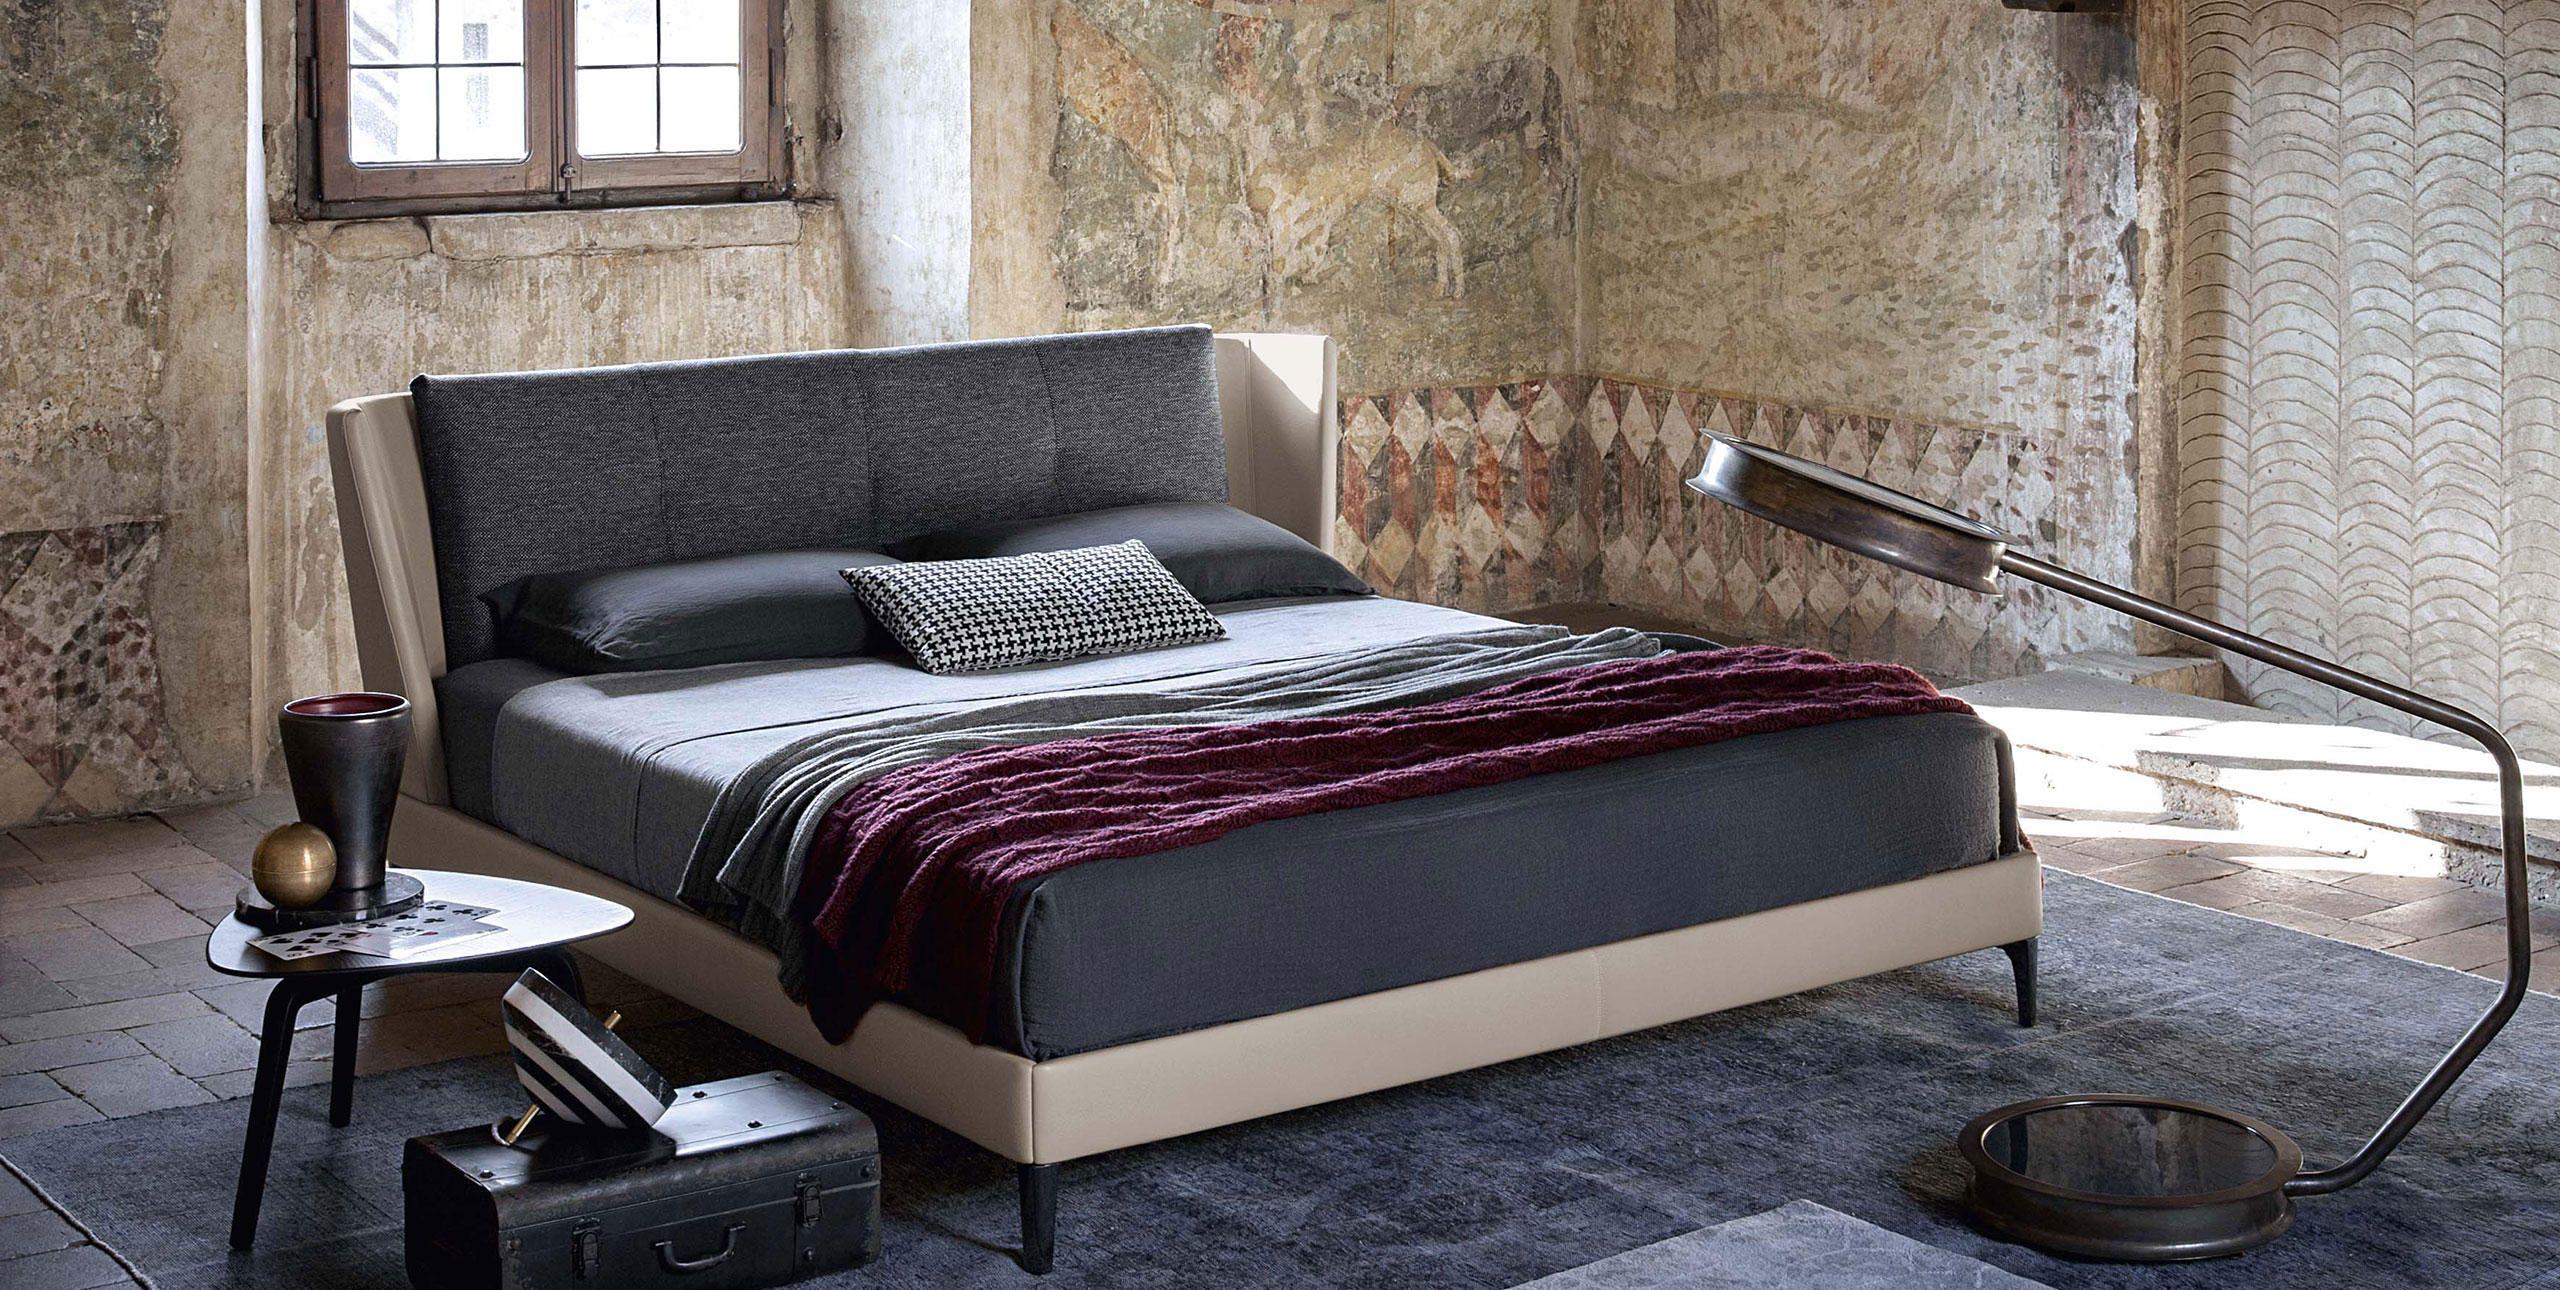 Poltrona Frau   Bretagn bed.   For more inspirations visit: www ...